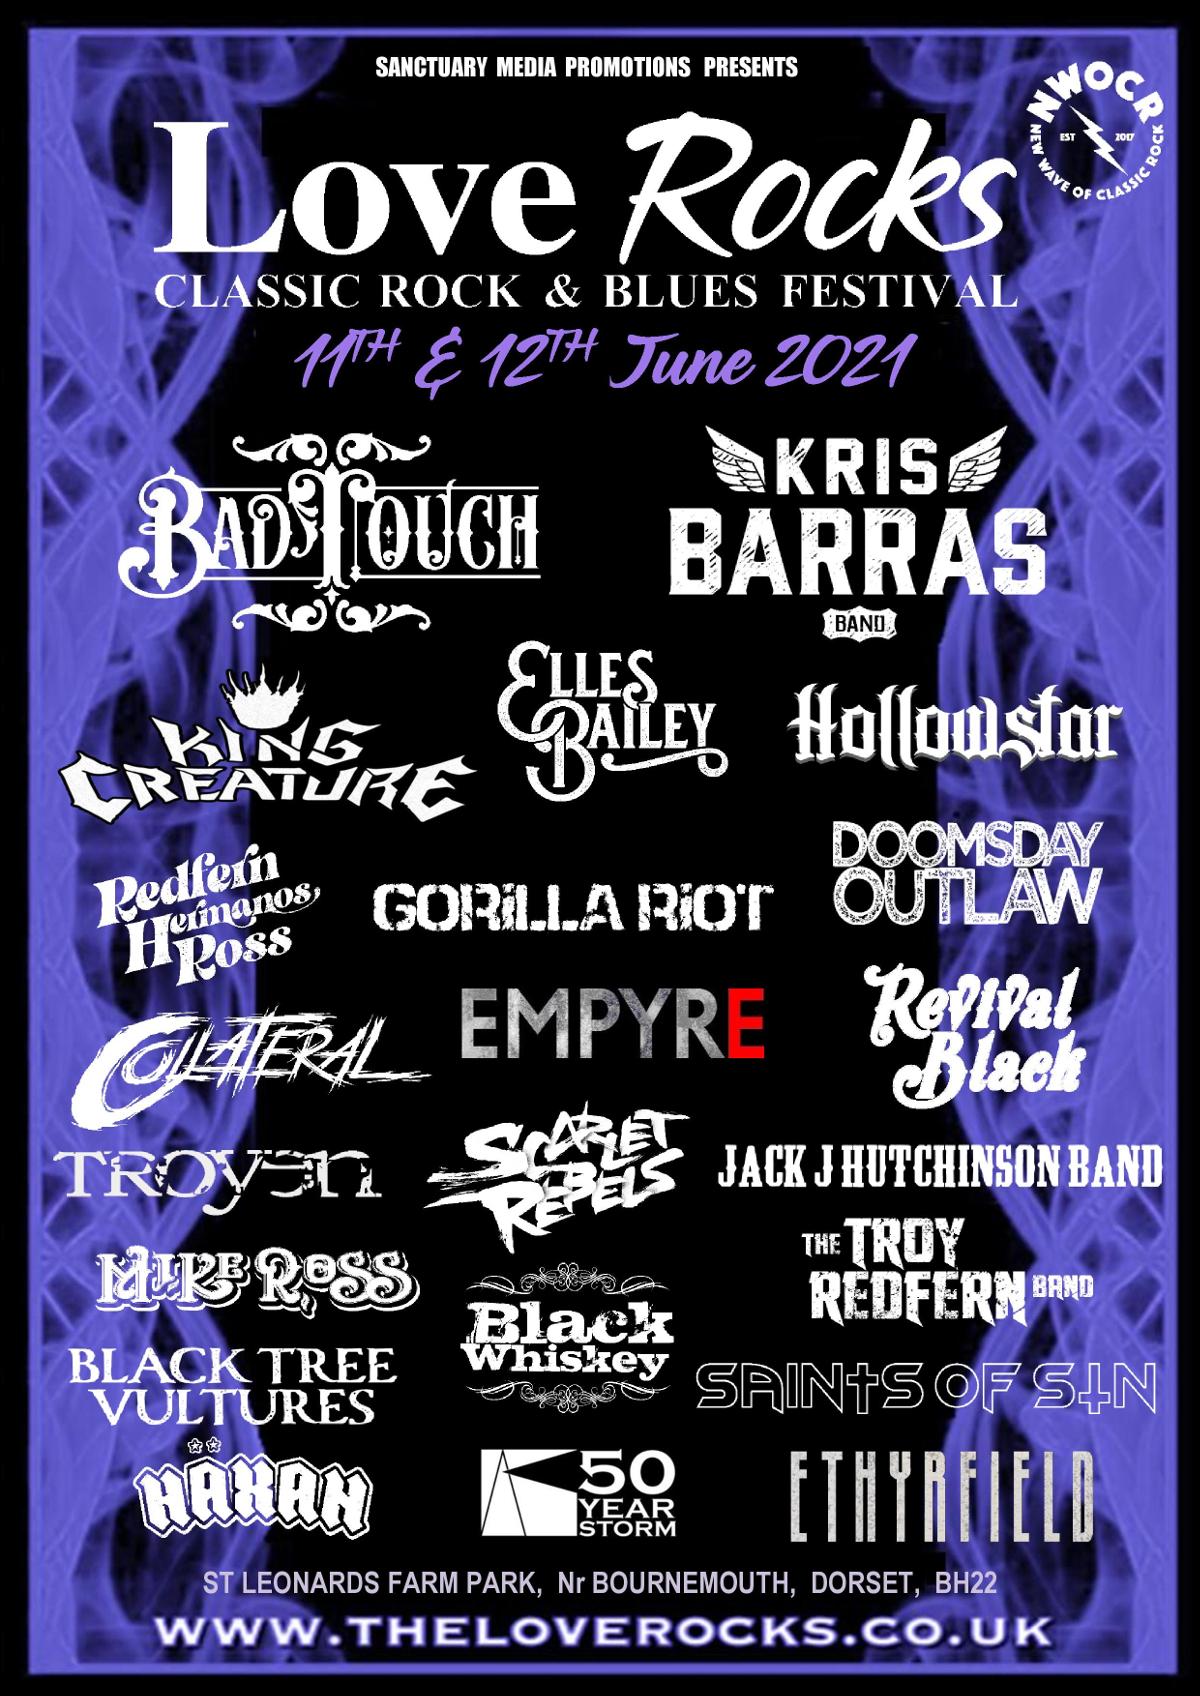 Love Rocks Classic Rock and Blues Festival 2021